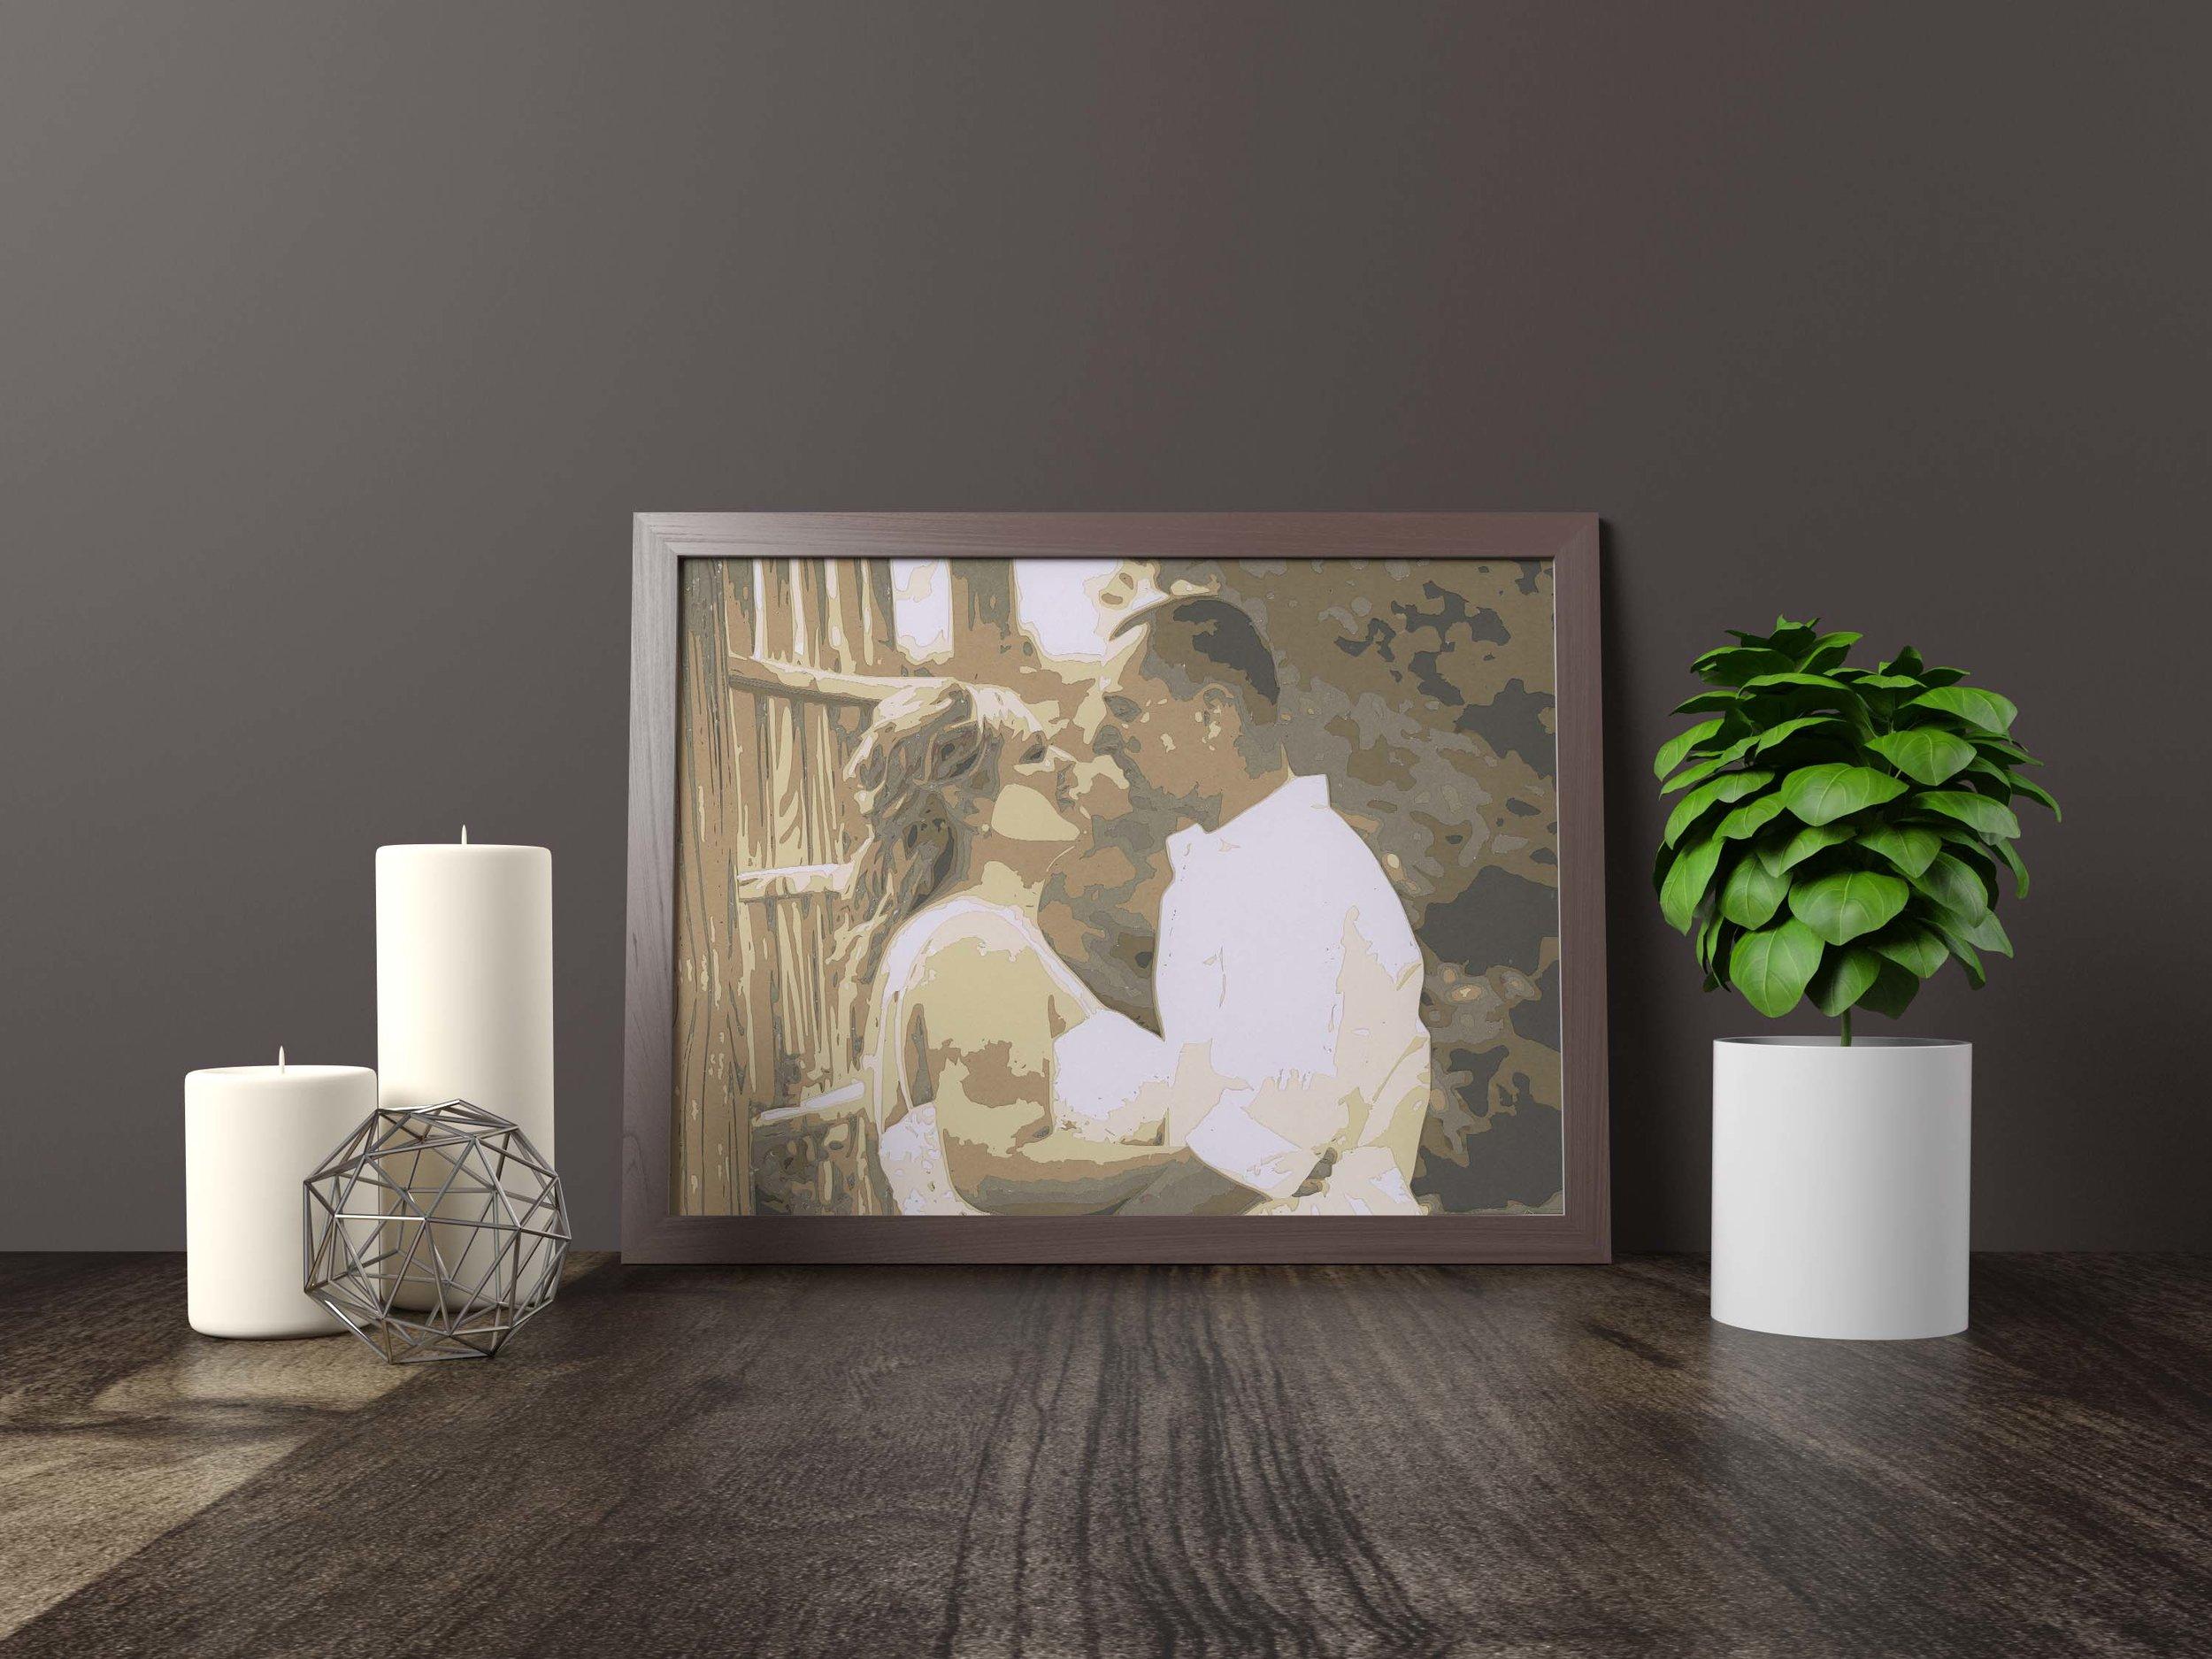 wedding portrait - Private Commission *SOLD* 11